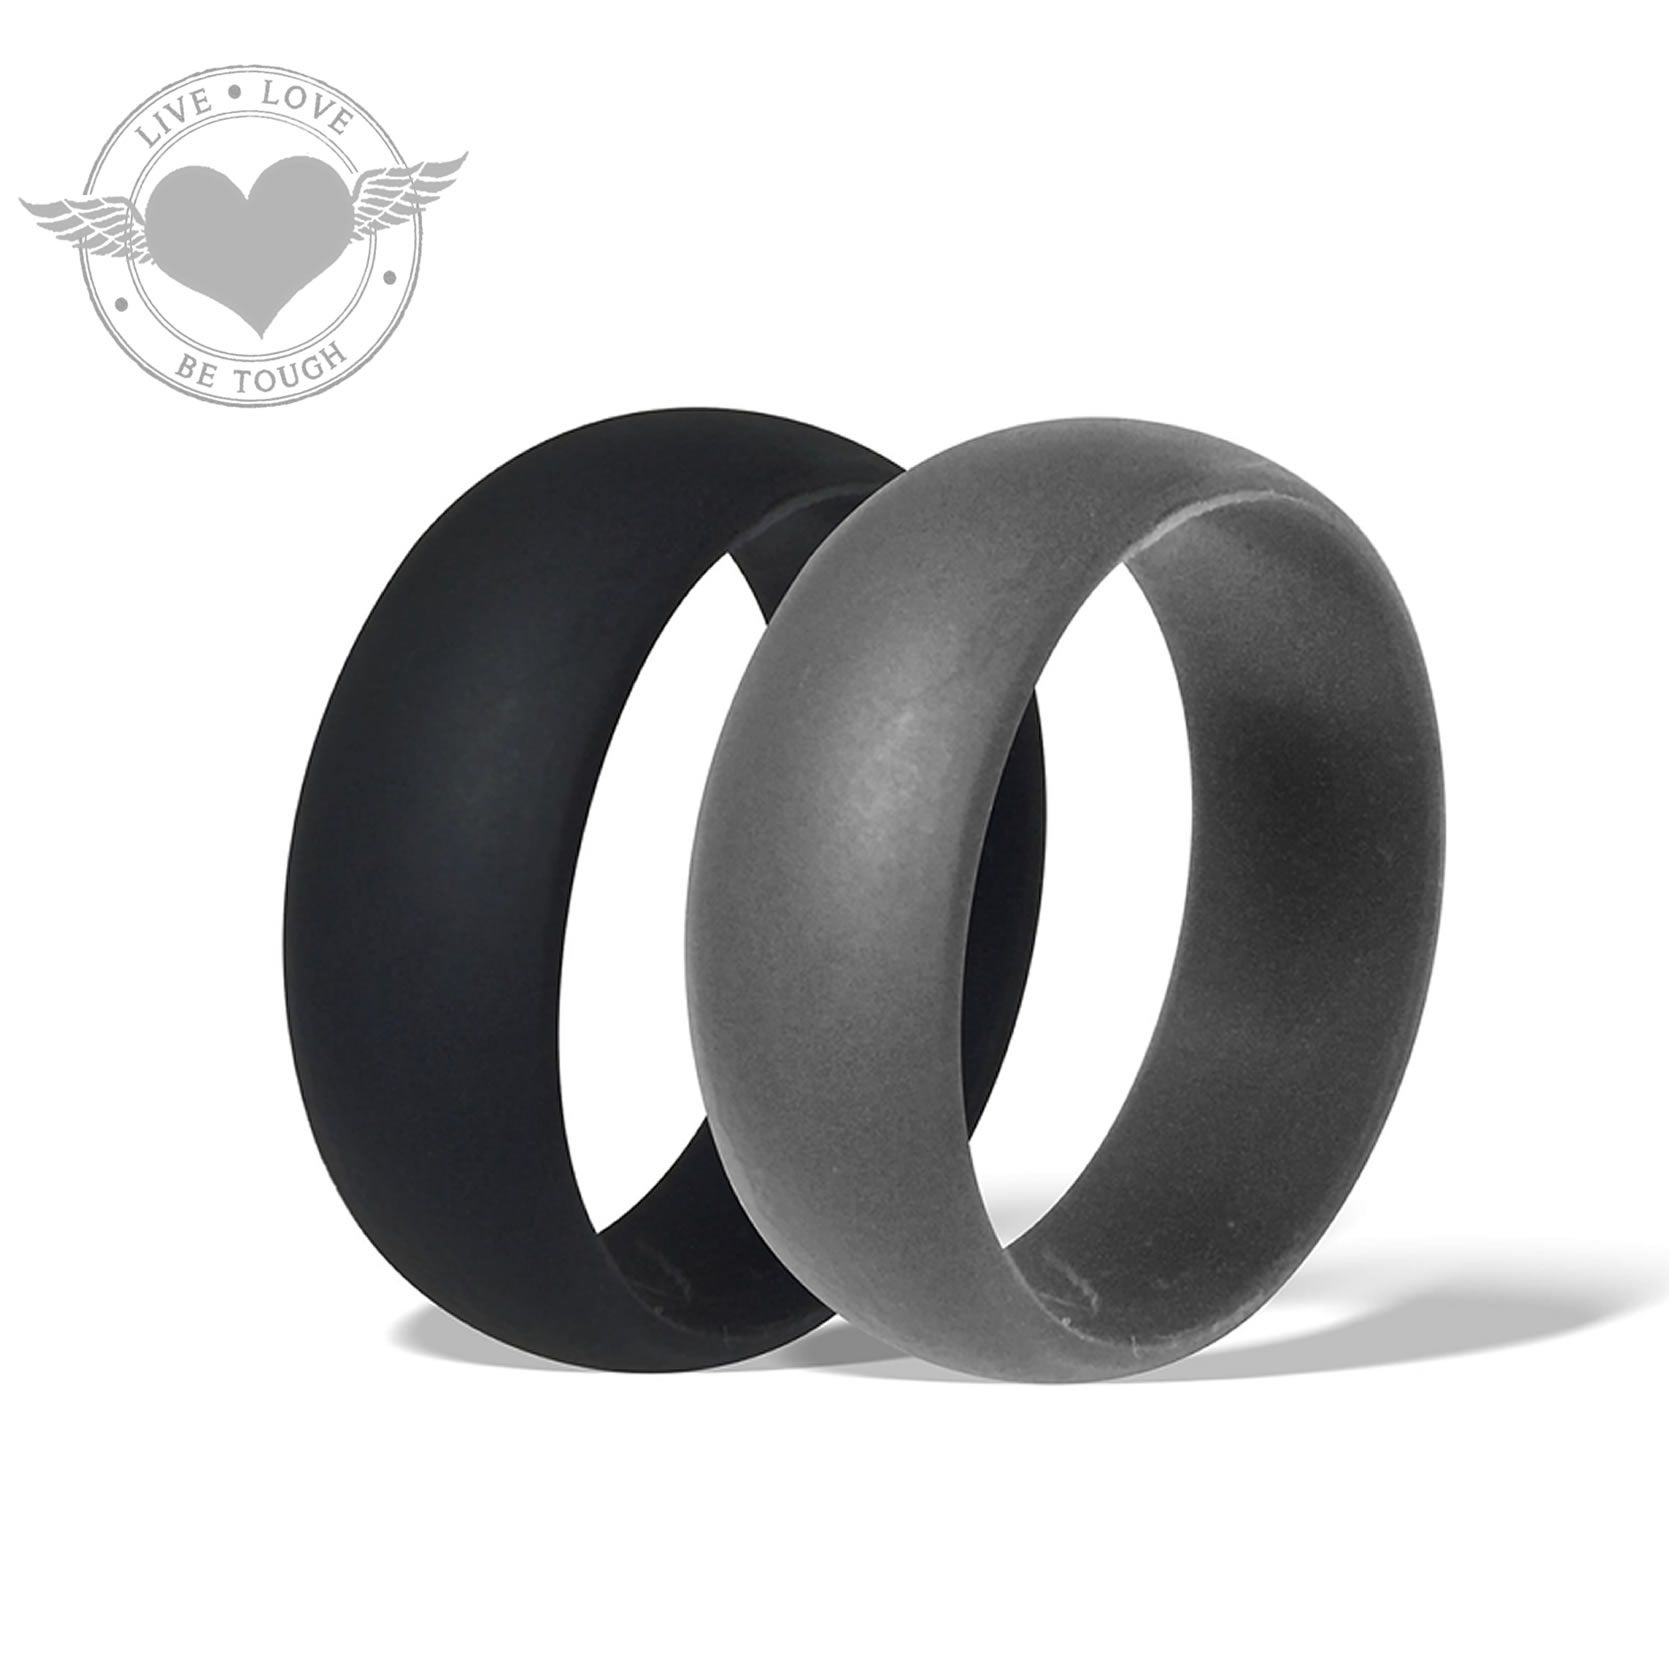 Tough Love Rings Silicone Rings Tlrings Wedding Ring Wedding